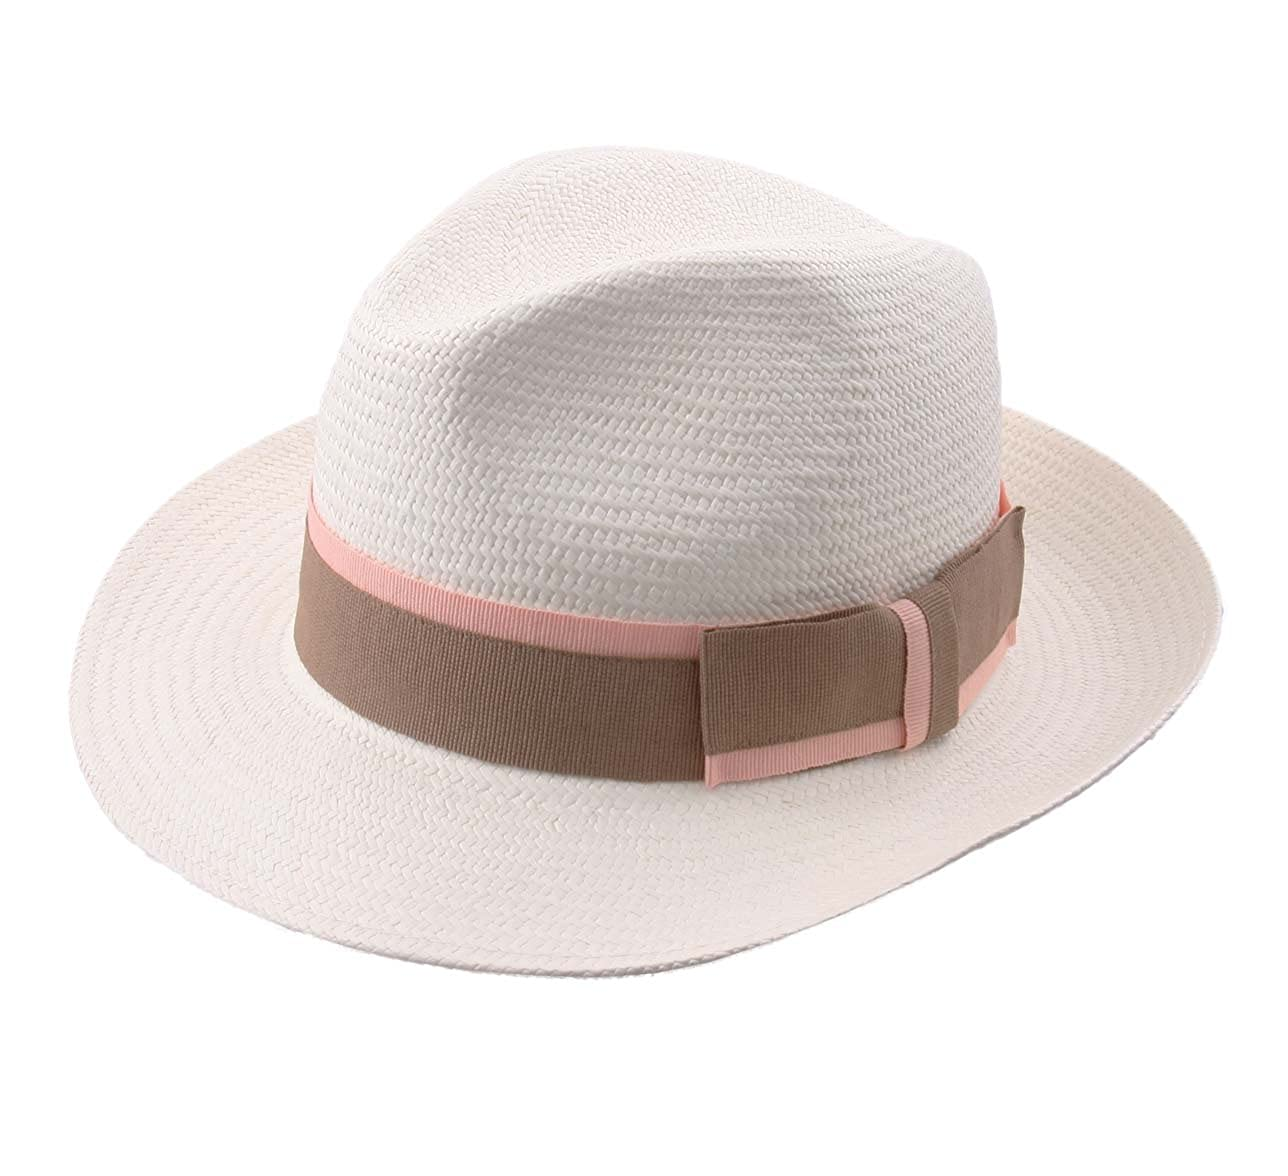 Modissima Equateur Panama Hat Size 60 Cm White